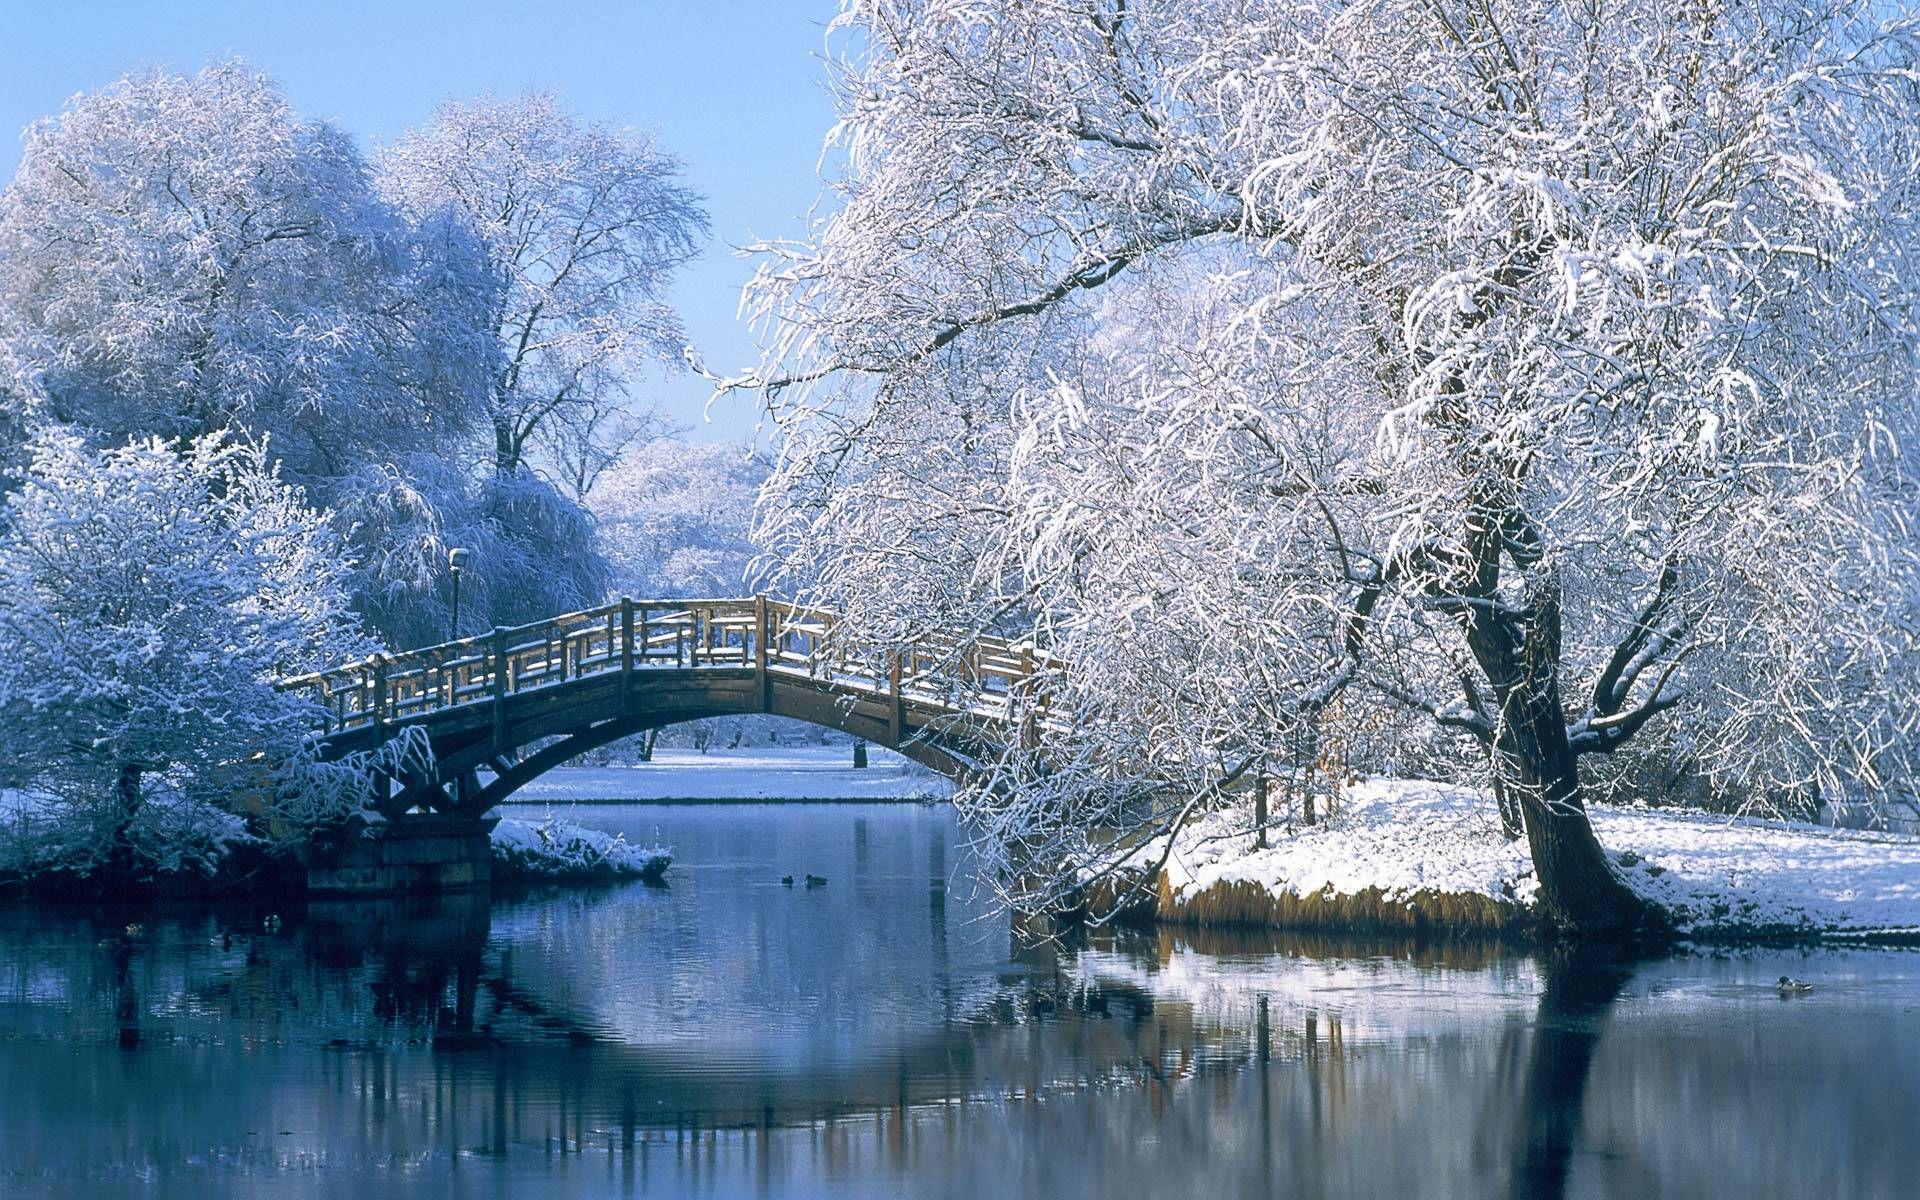 winter scenes for desktop wallpapers - hd wallpapers inn | bridges